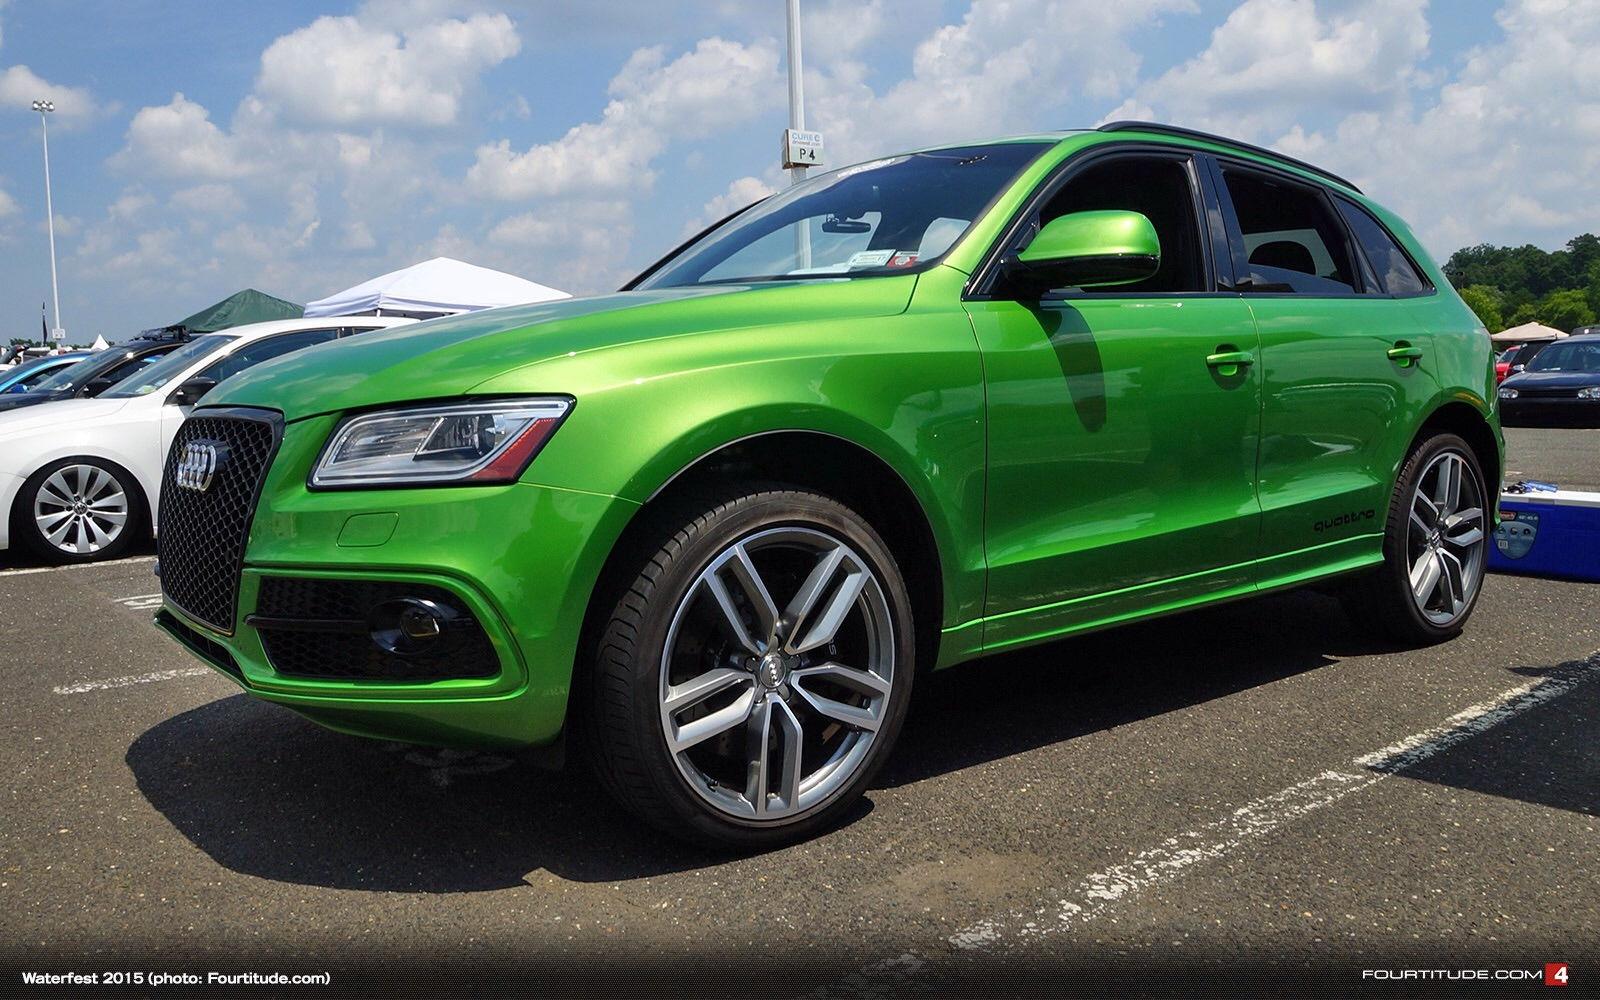 2015 Audi Exclusive Sq5 Th3 Hulk Build Photo Thread